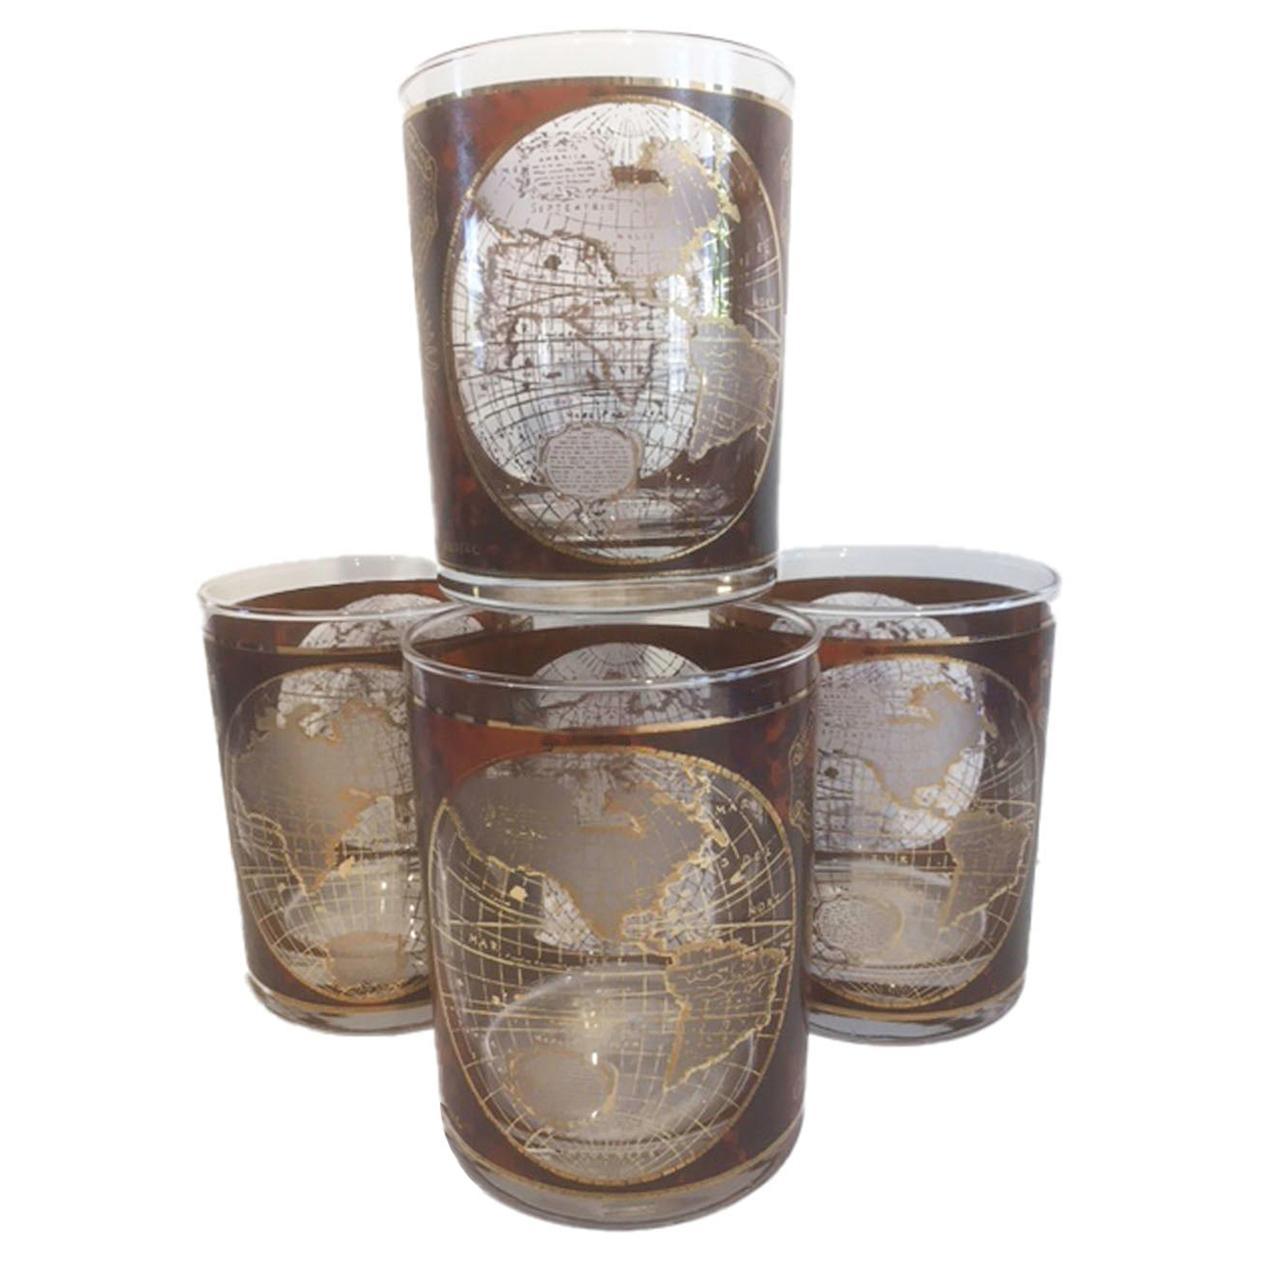 4 Vintage Culver, Terrarum Orbis Geographica Double Rocks Glasses